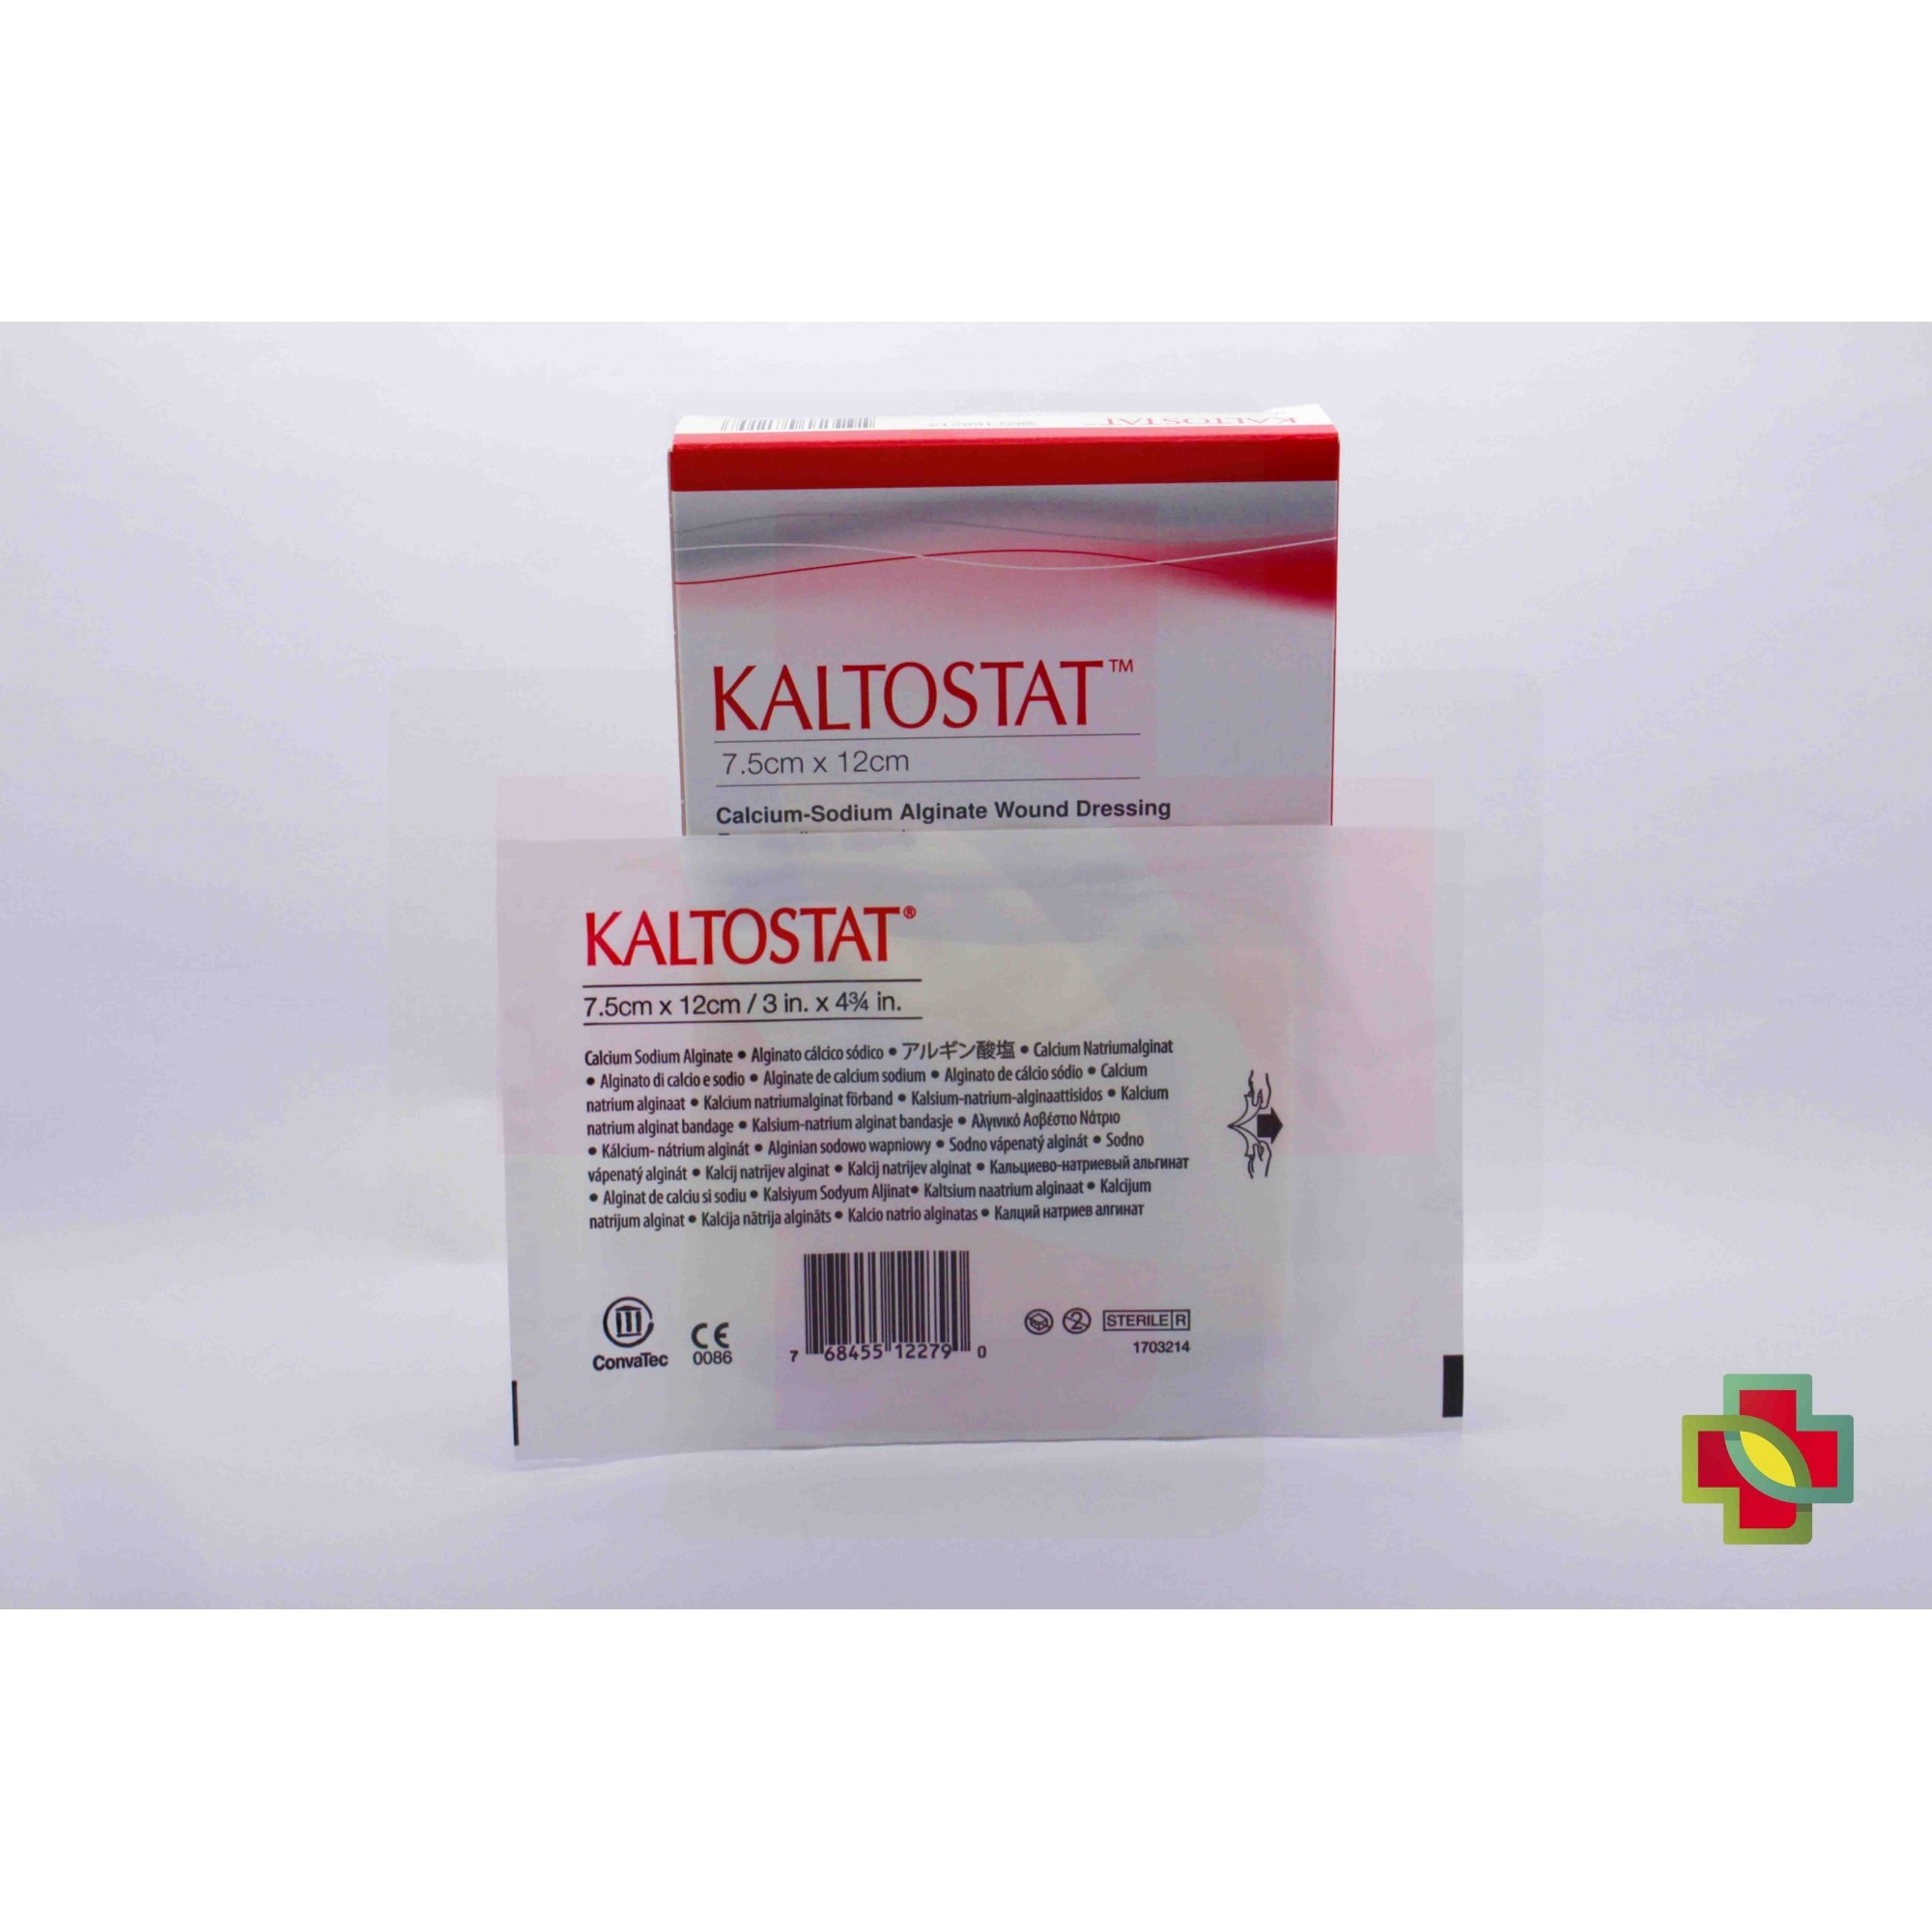 CURATIVO KALTOSTAT 7,5 X 12 CM (C/ 10 UNDS.) 168212 - CONVATEC